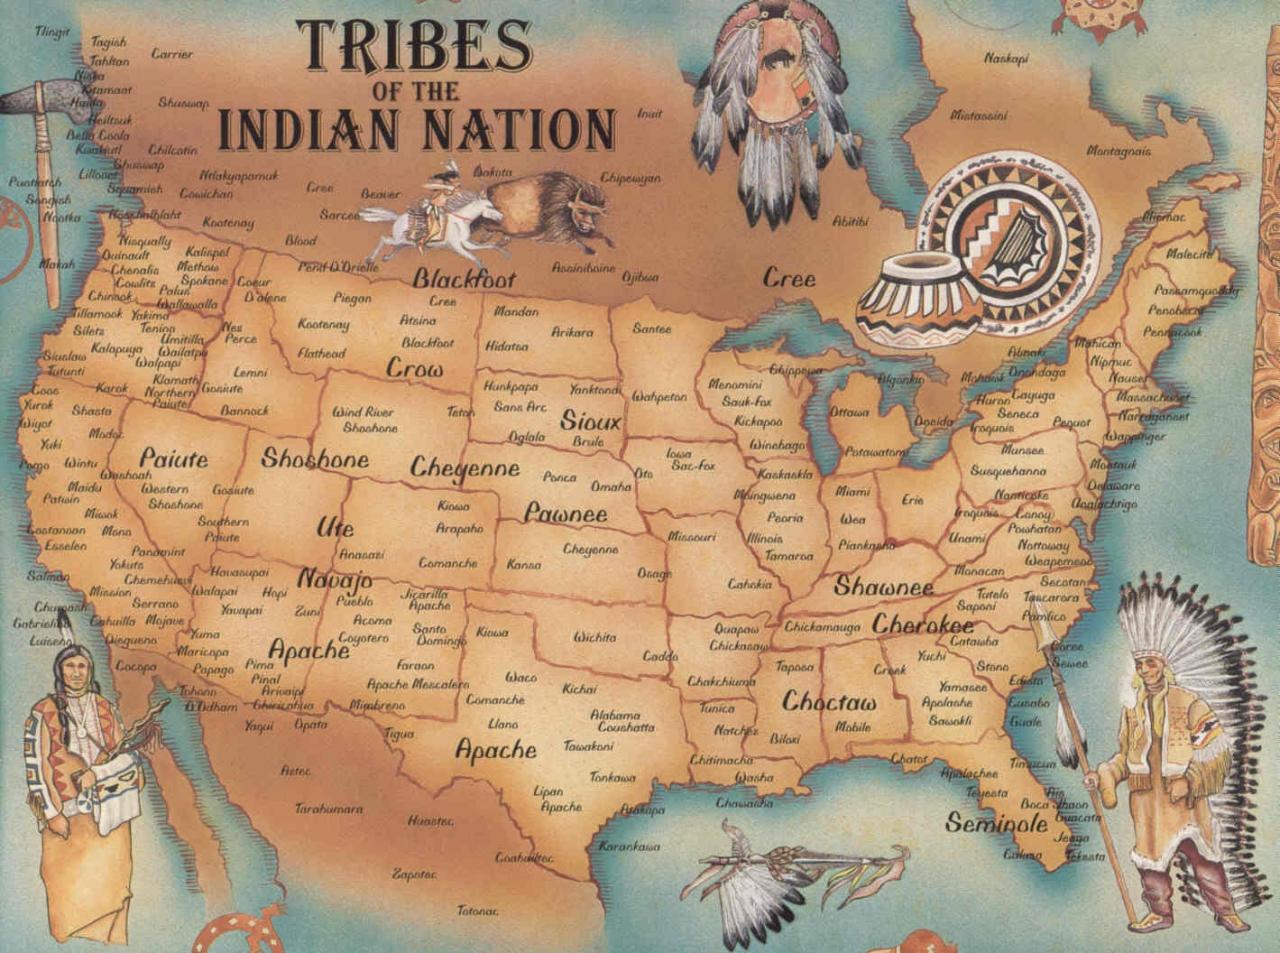 Plemena v ZDA Vir: http://community.dewereldmorgen.be/